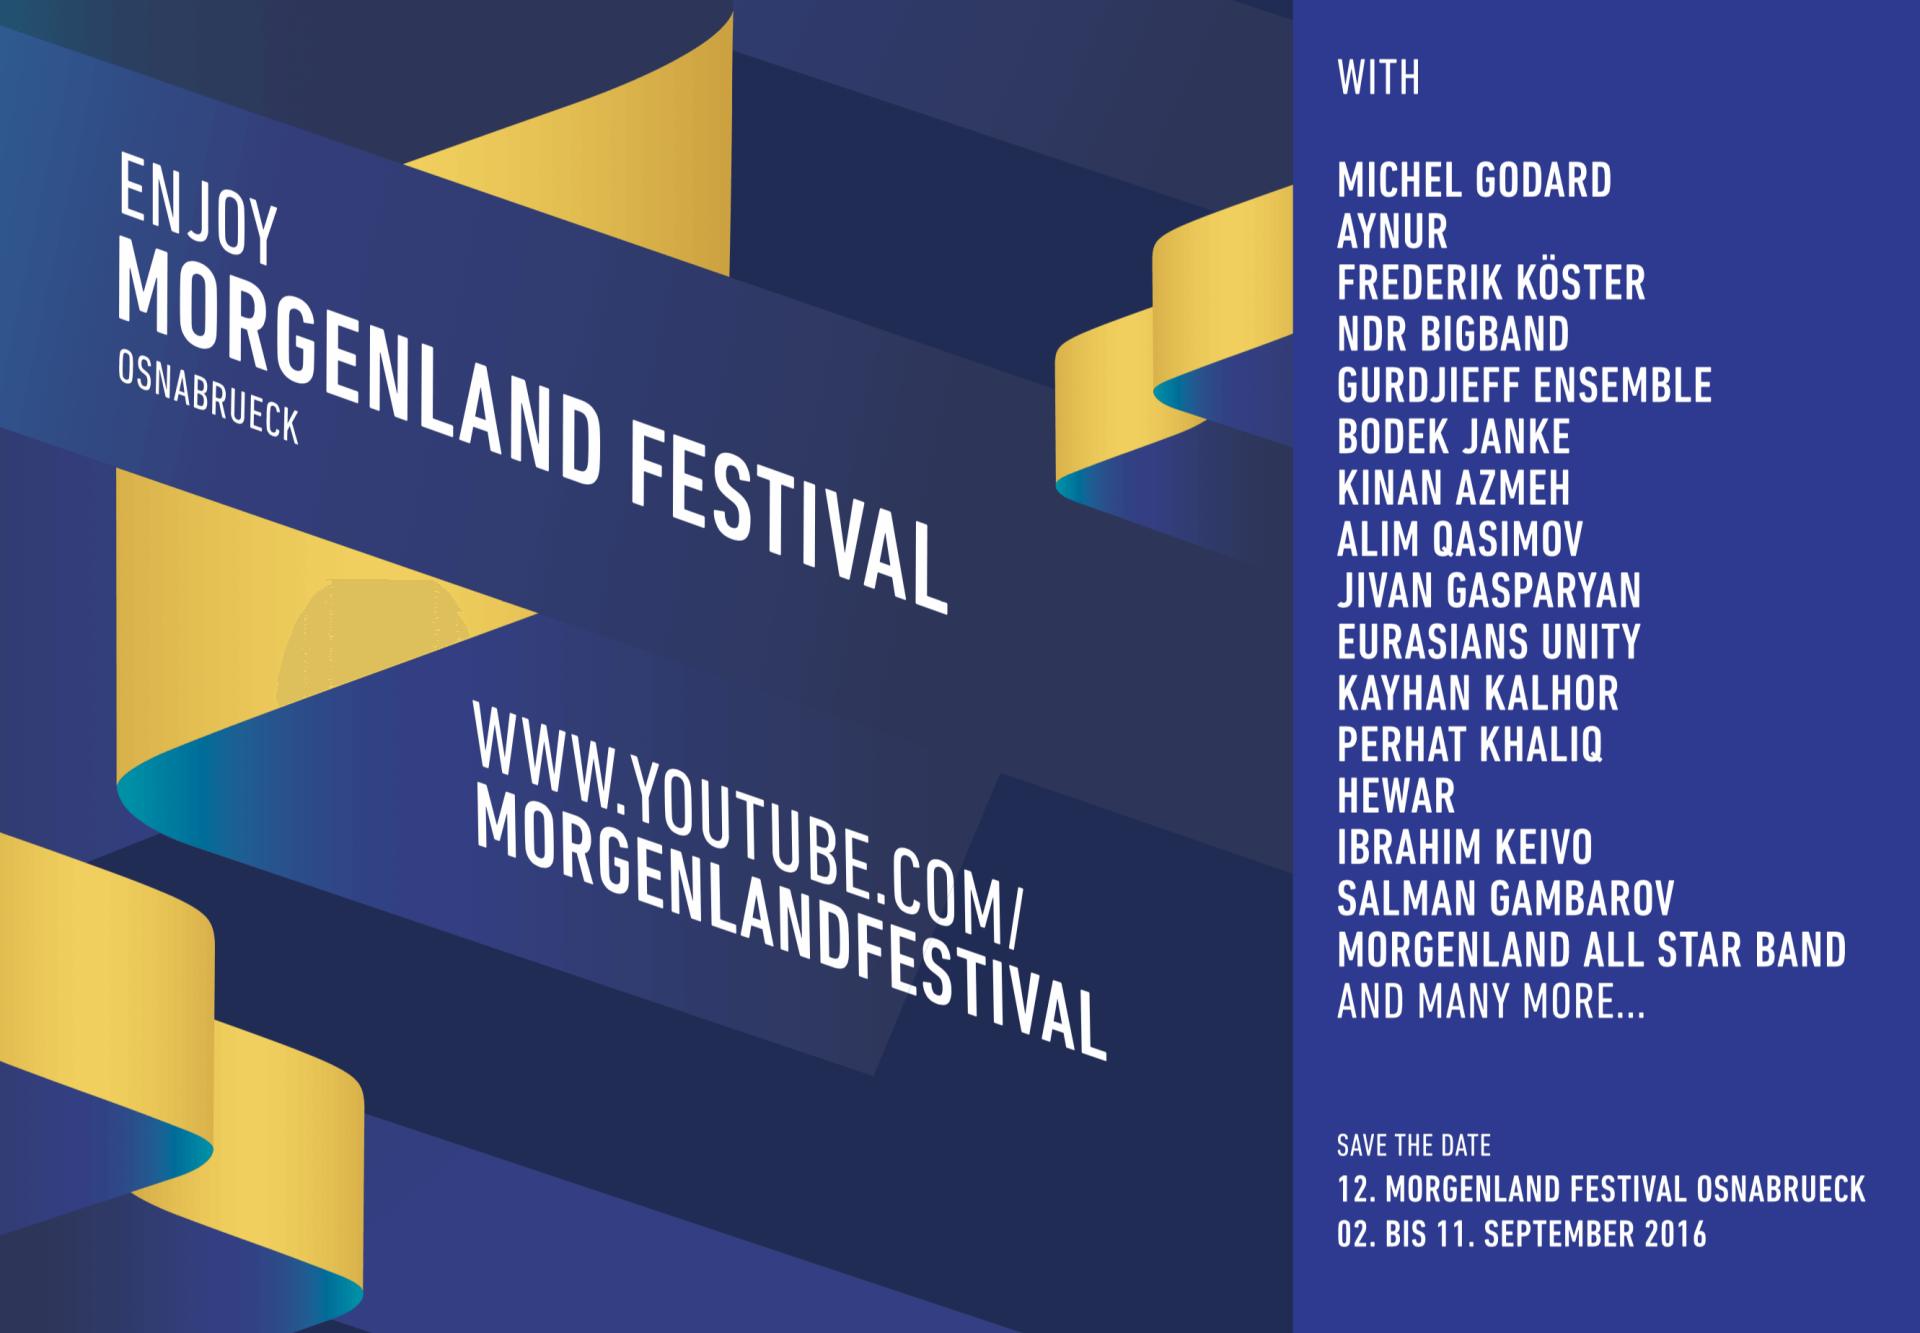 Junic Studio Morgenland Festival Osnabrück